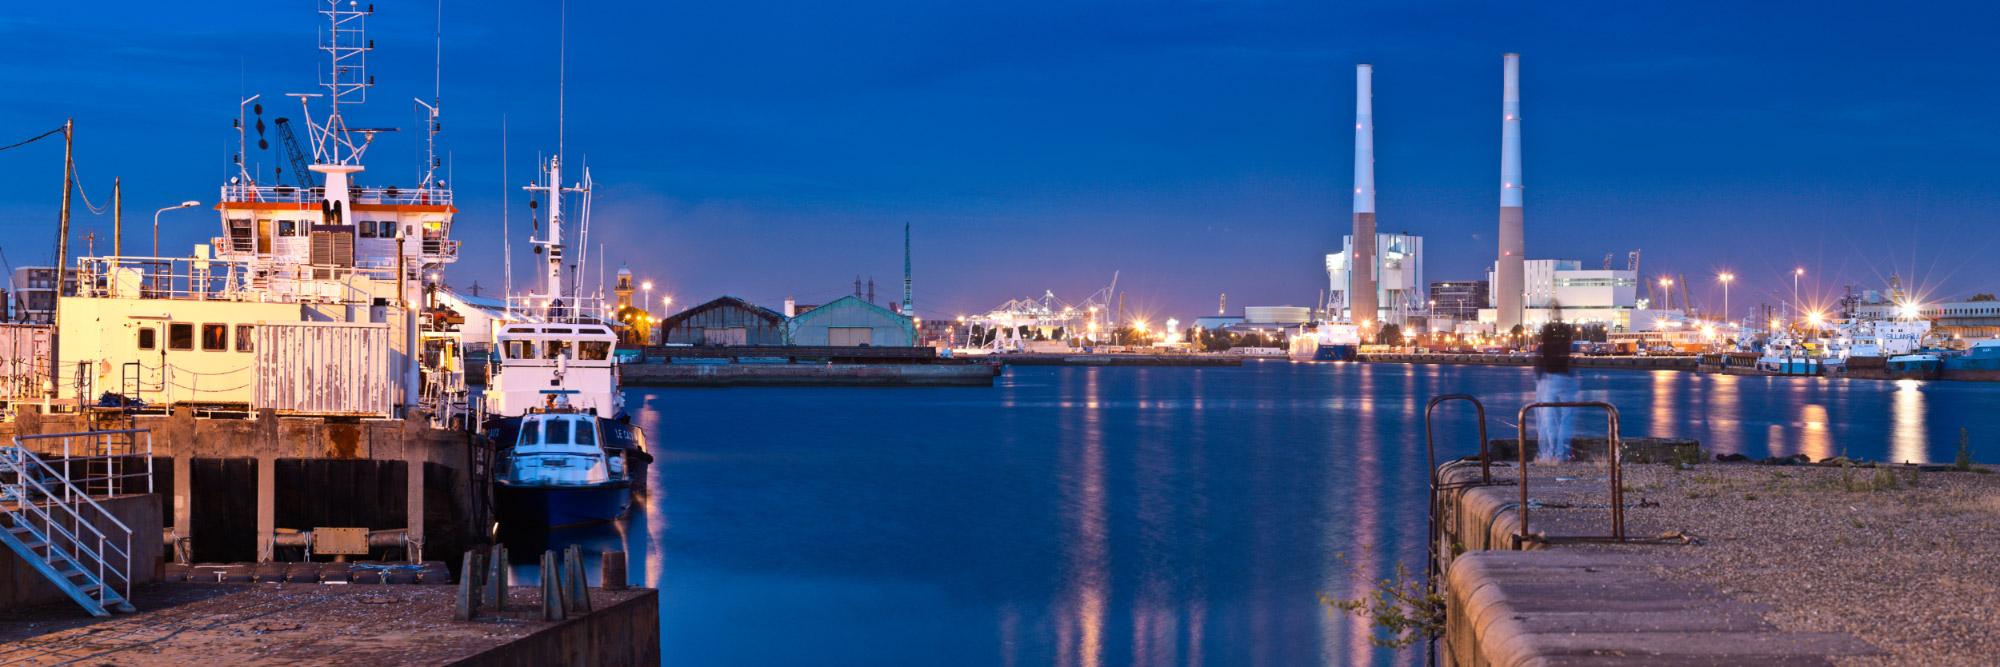 Bassin de la Citadelle, Le Havre